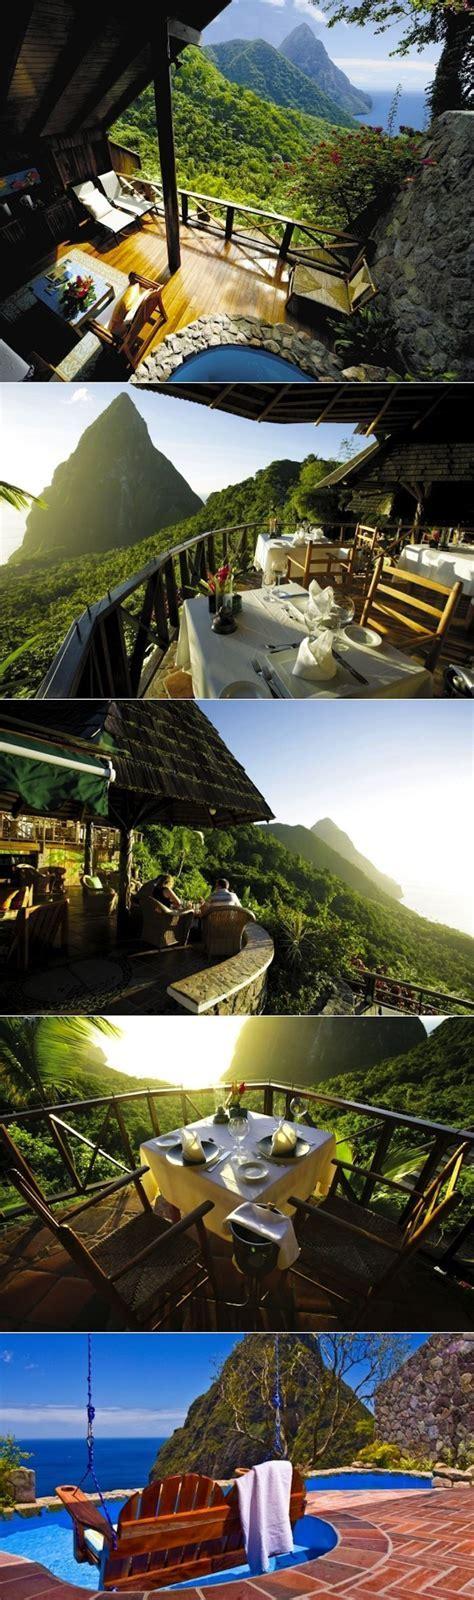 20  best ideas about St Lucia Hotels on Pinterest   Saint